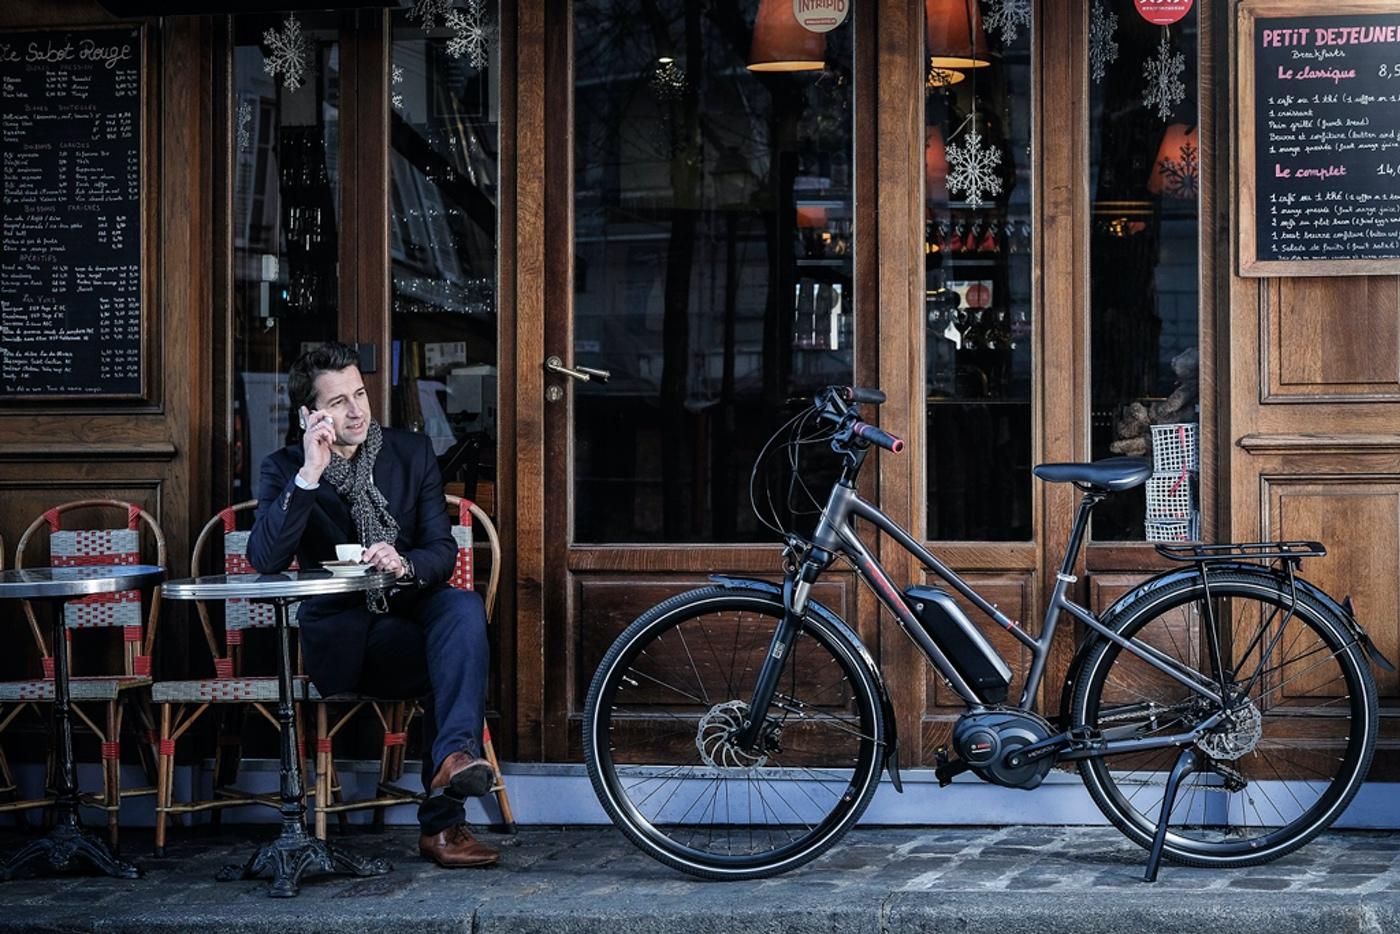 e-bikes Peugeot: nueva gama disponible en España